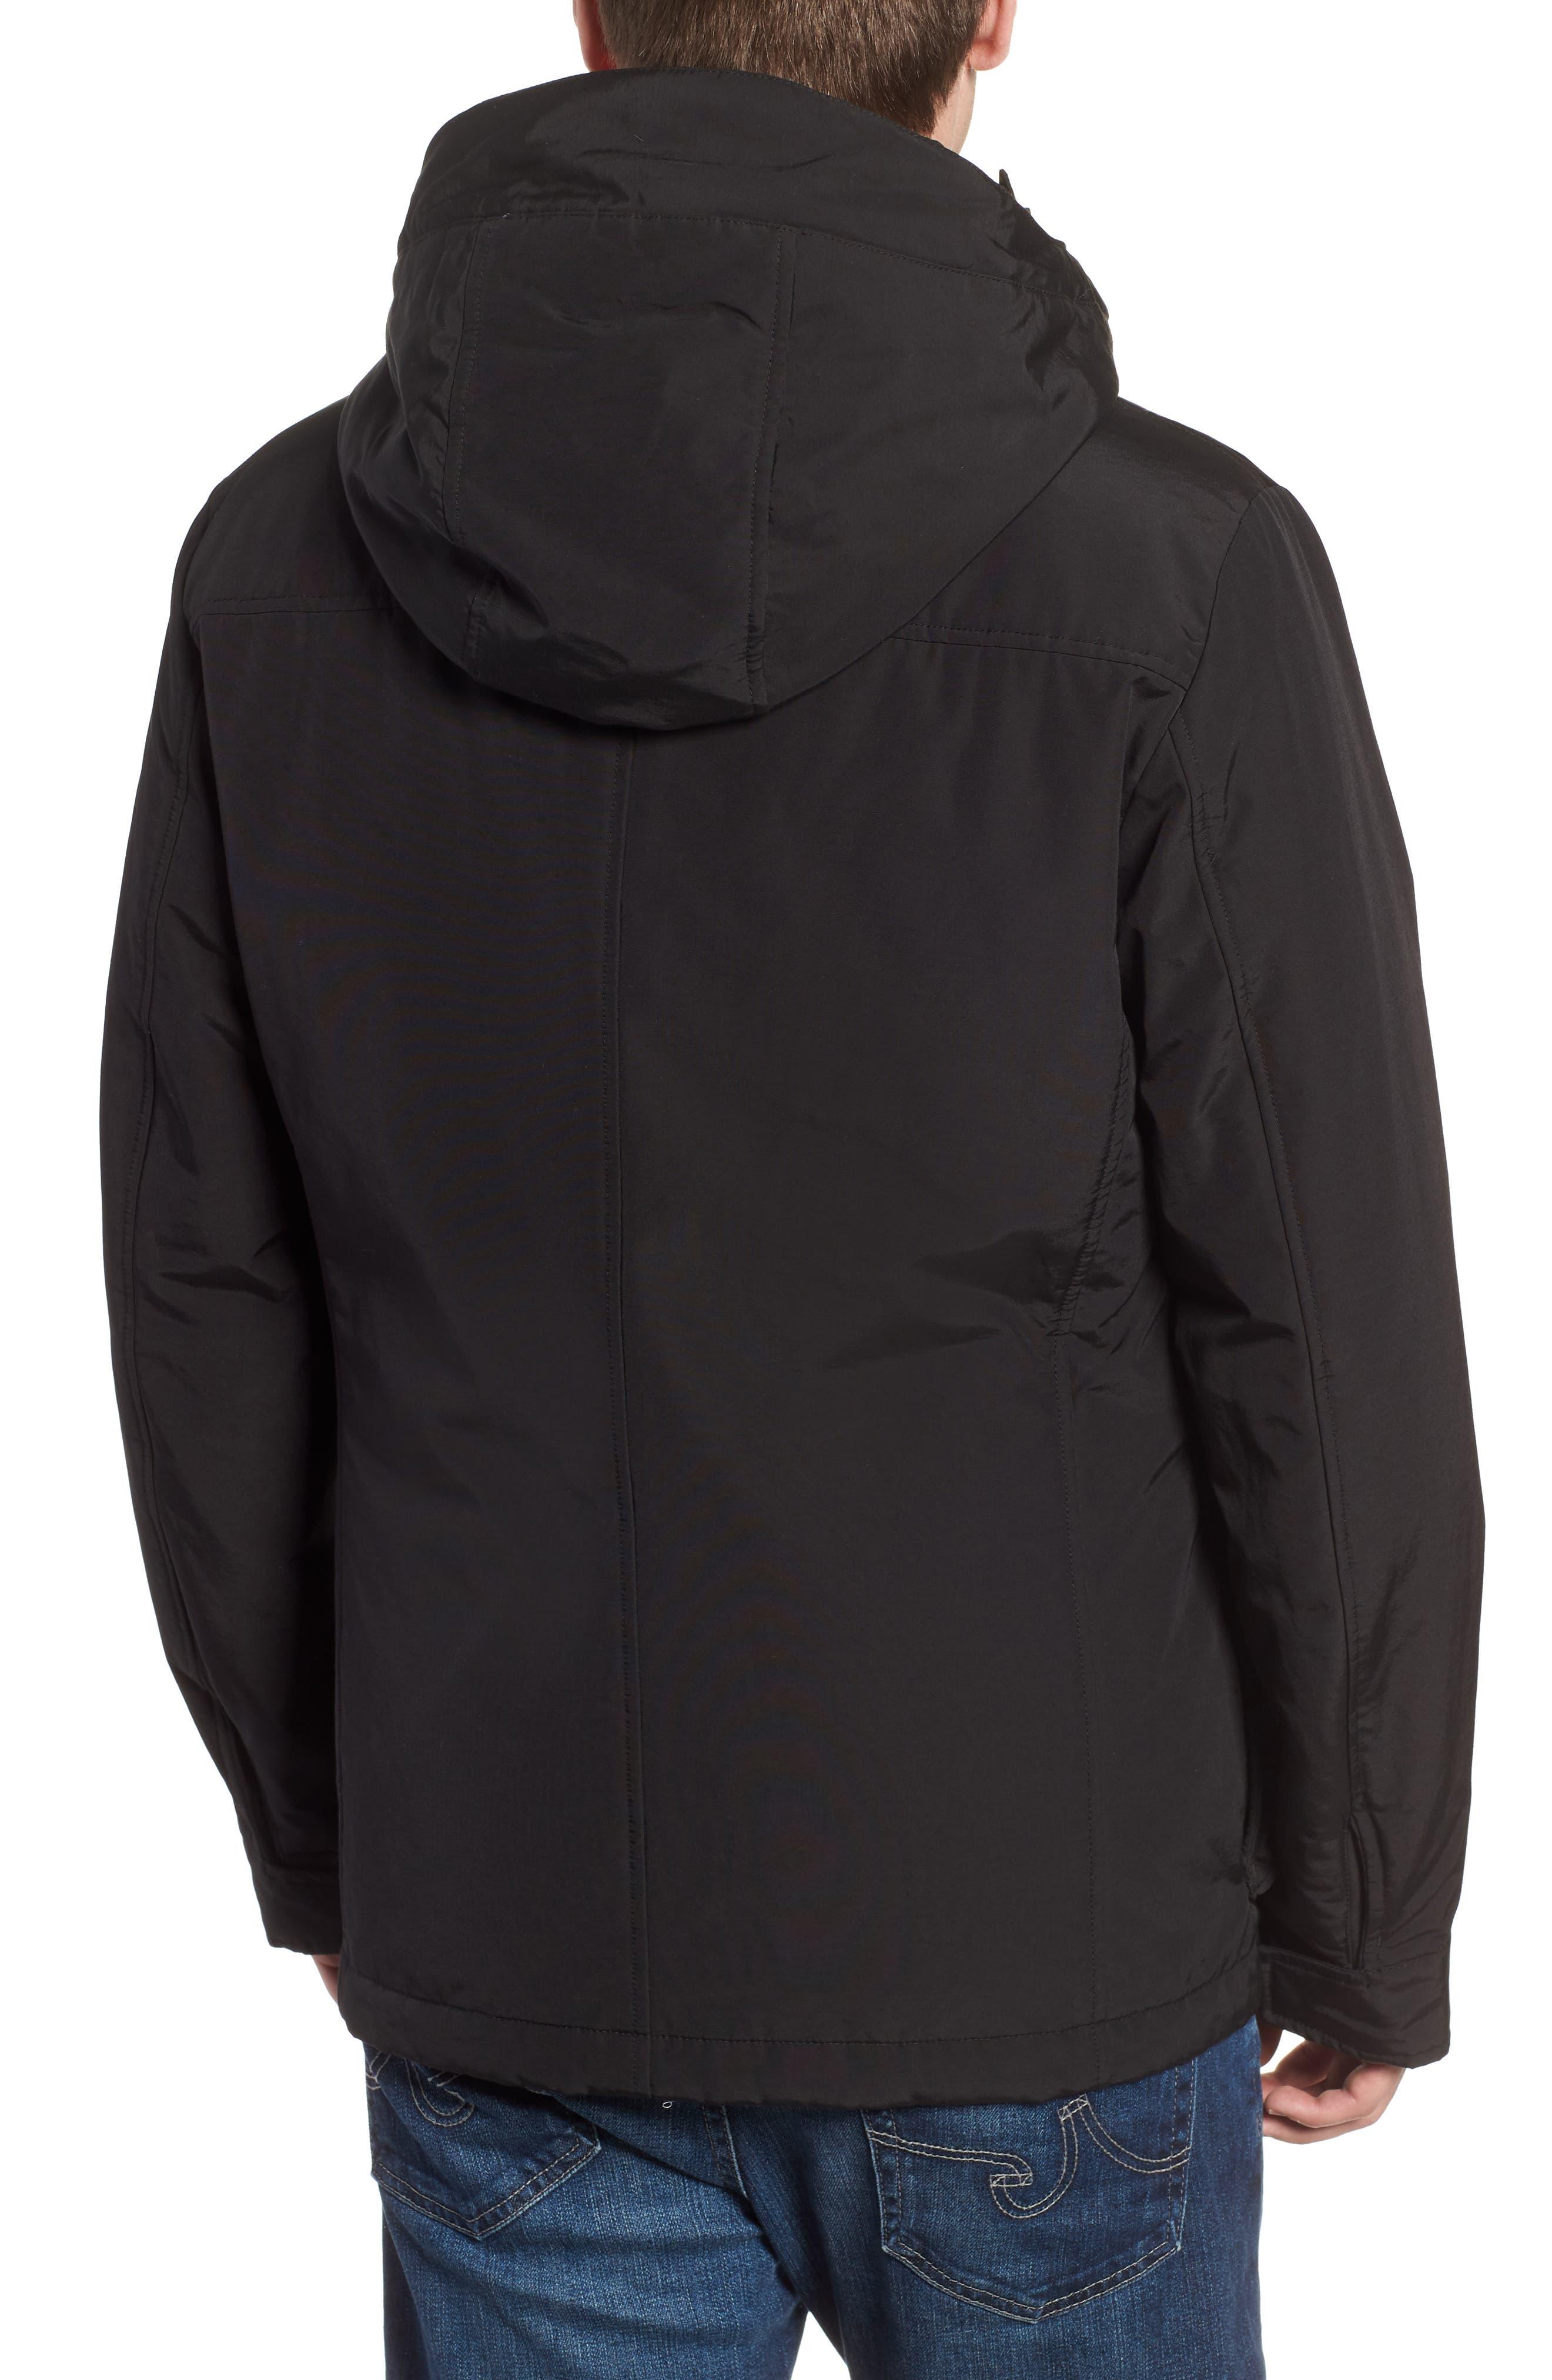 Camou Field Jacket,                             Alternate thumbnail 2, color,                             BLACK